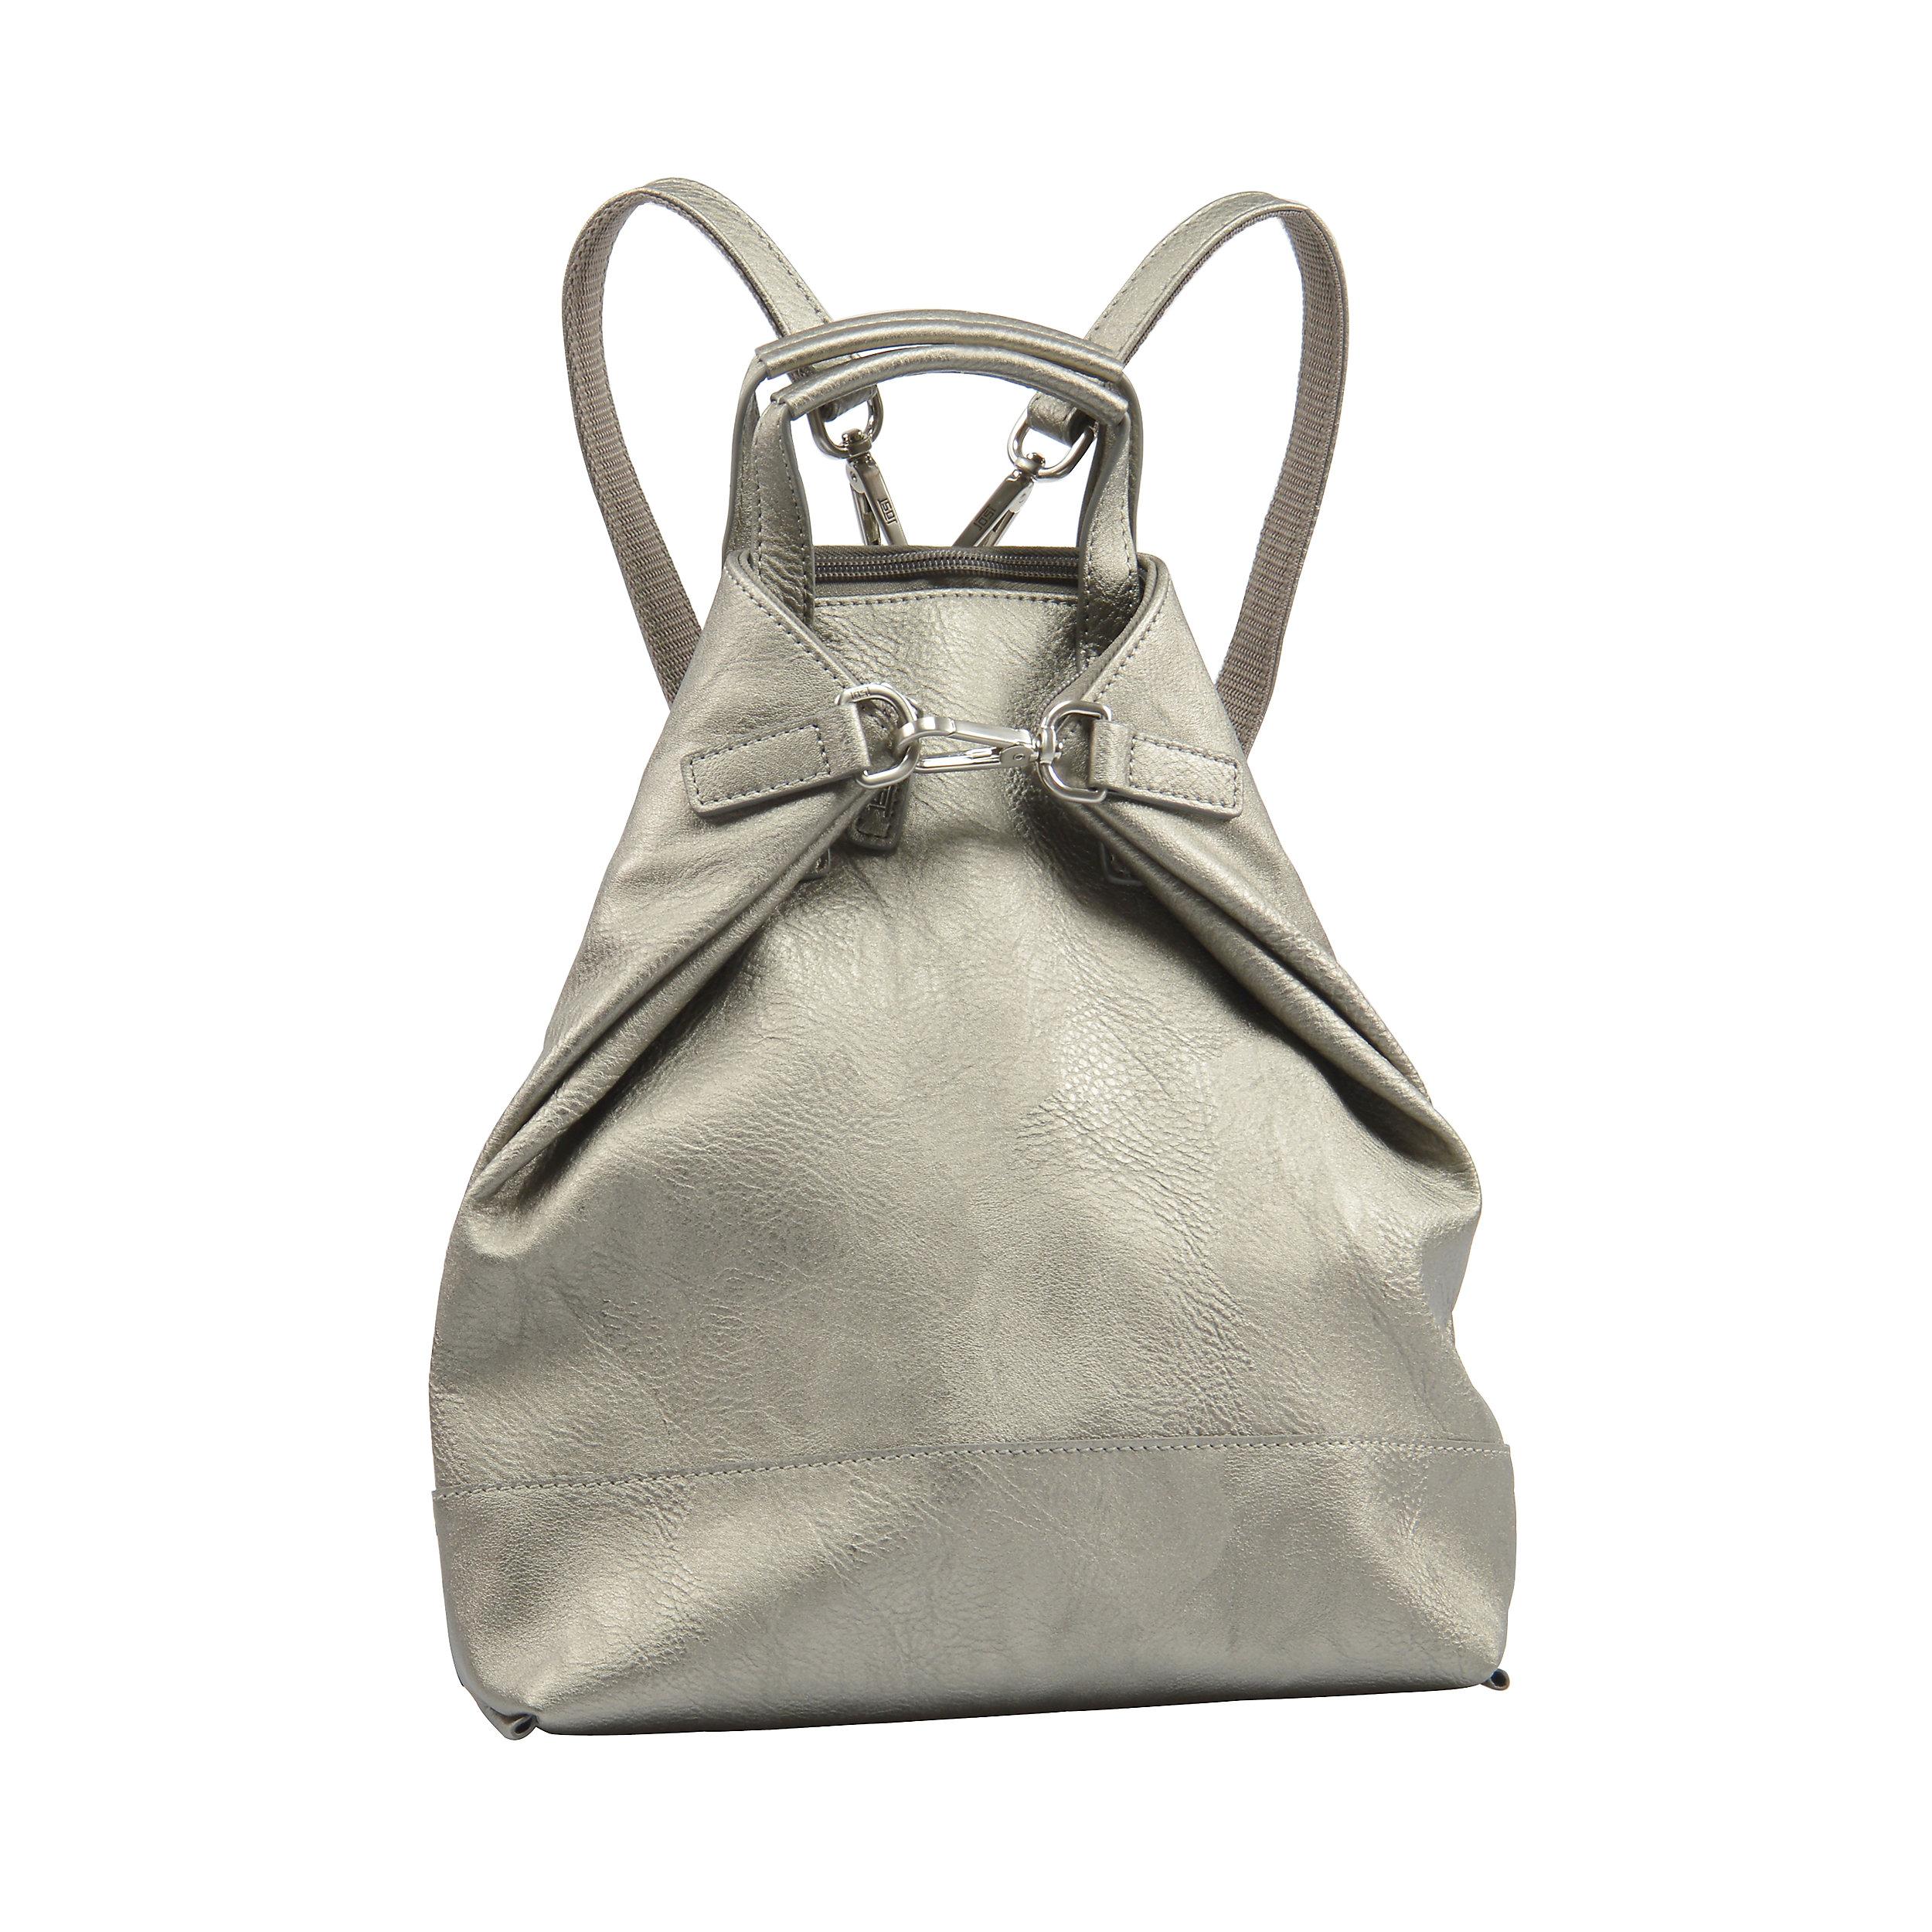 Backpack XChange Bag 3in1 13 Inch XS Merritt 5 Liter